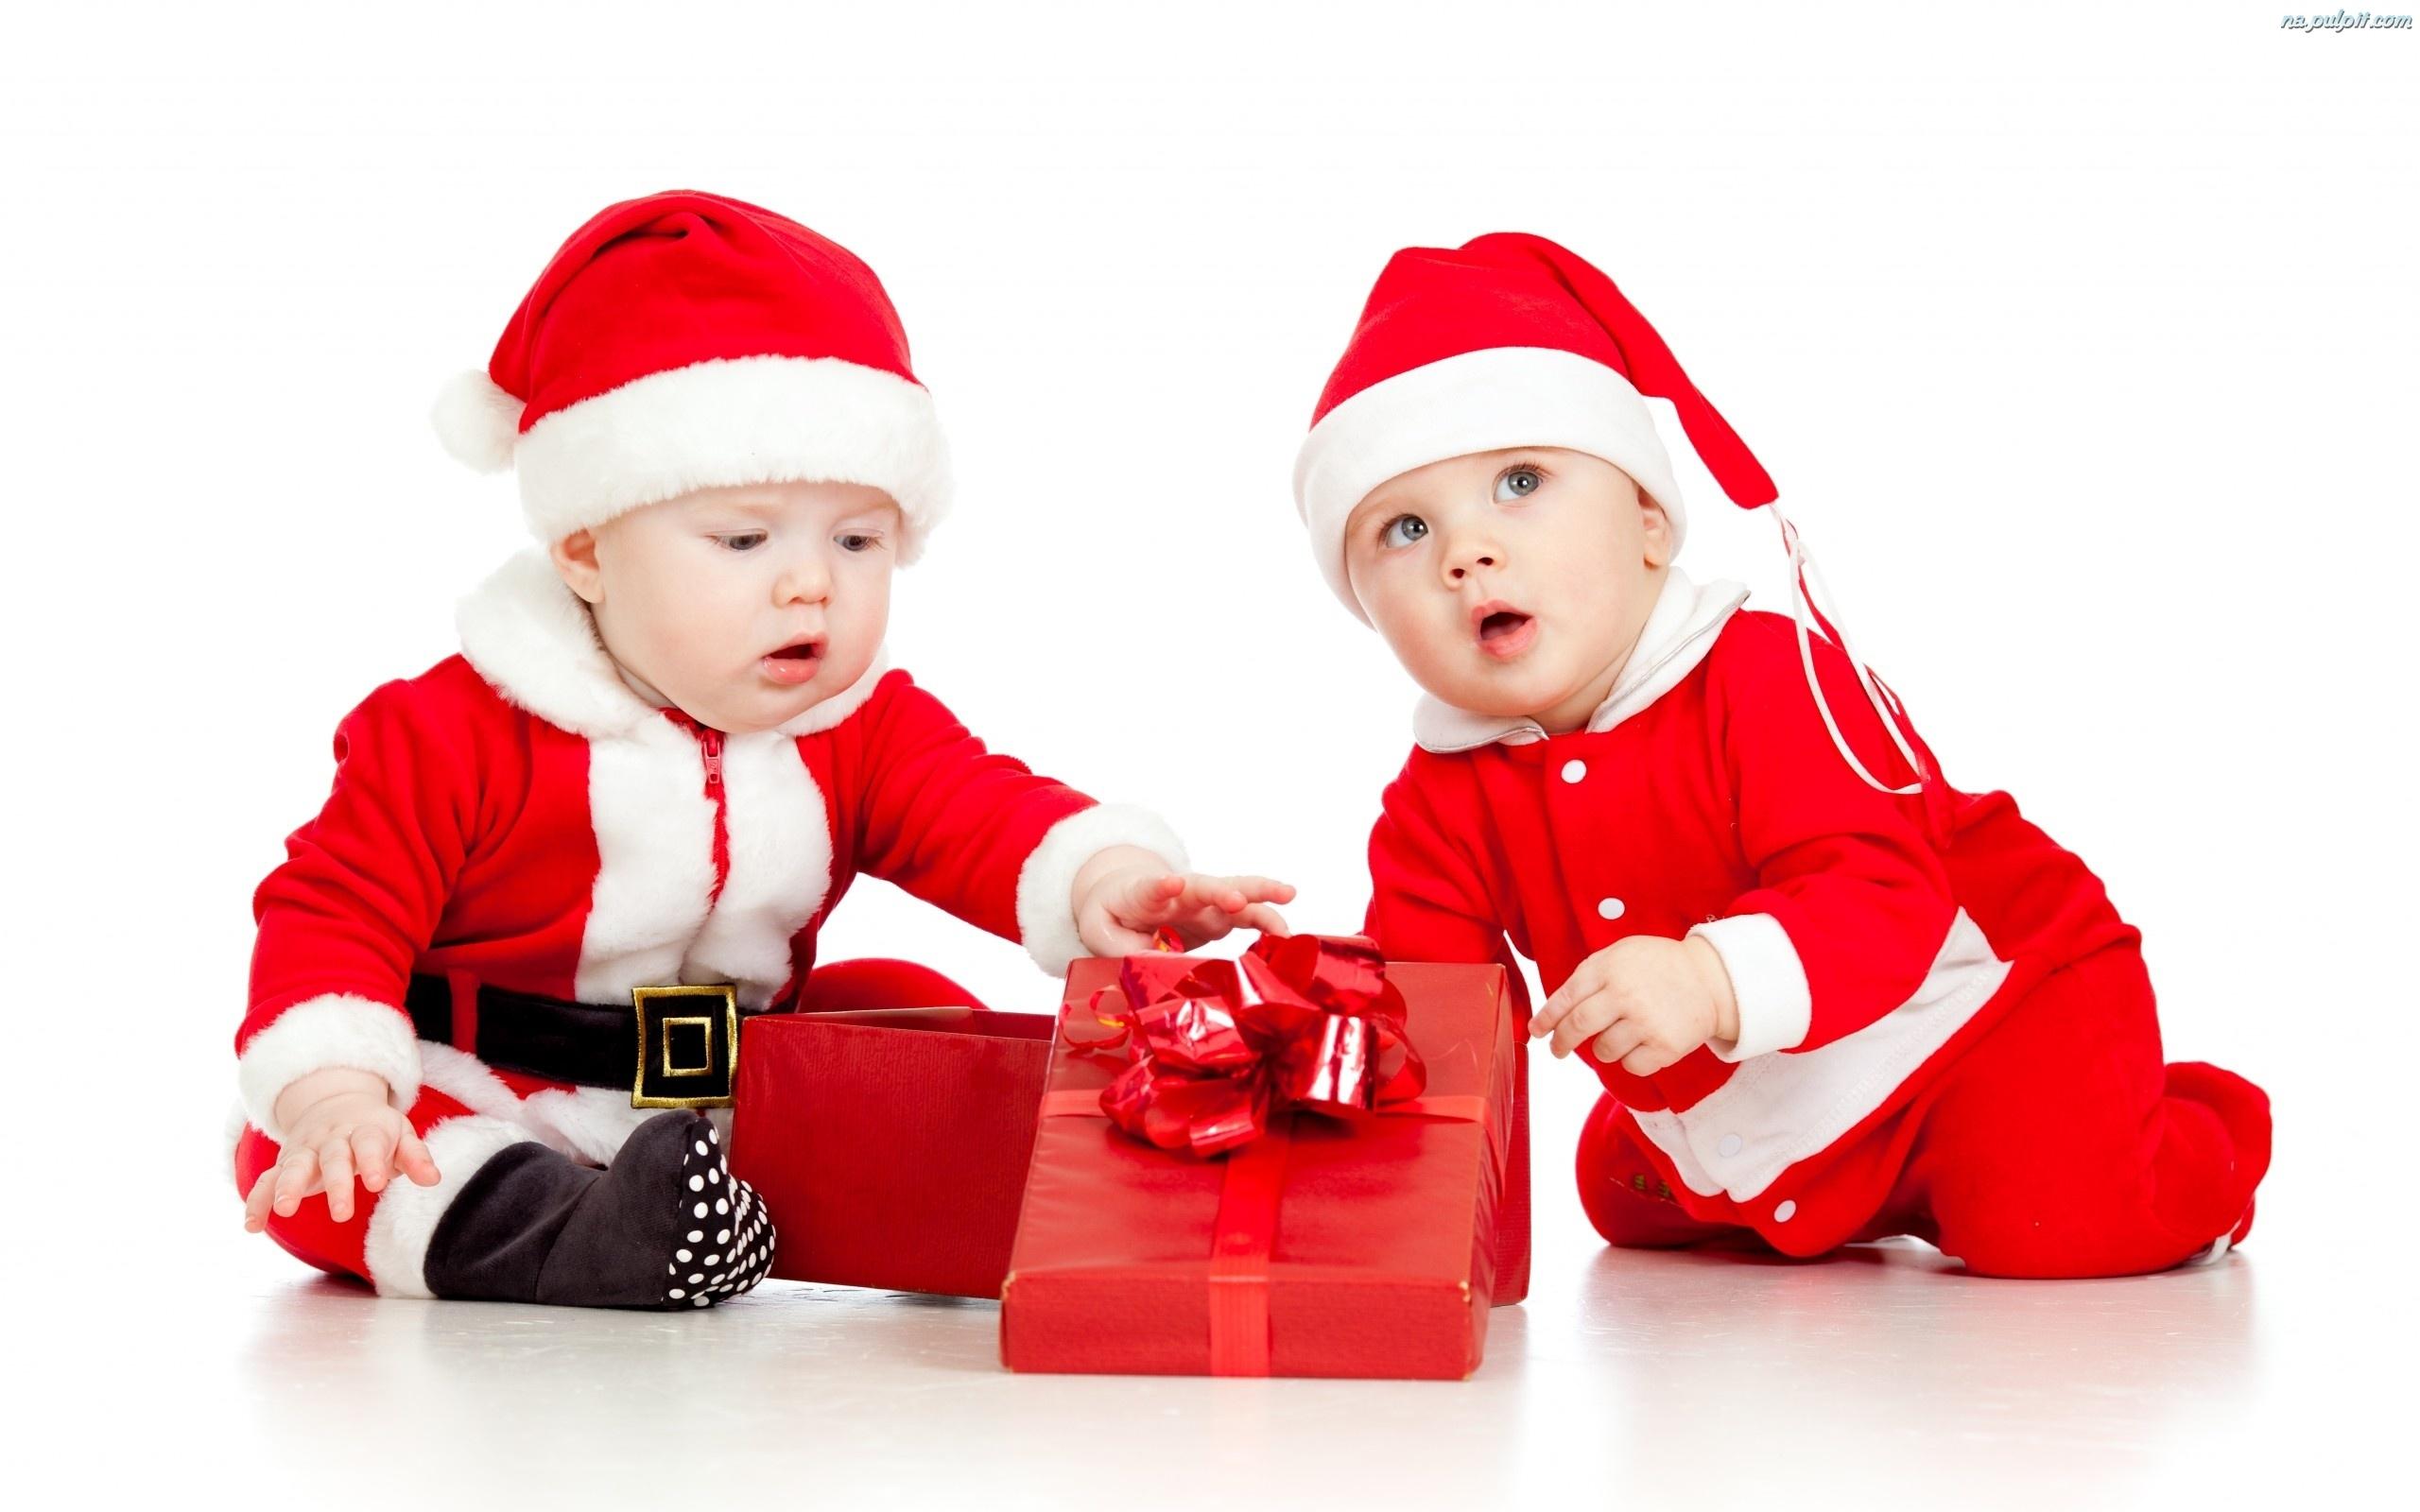 prezent str j dzieci dwoje miko aja na pulpit